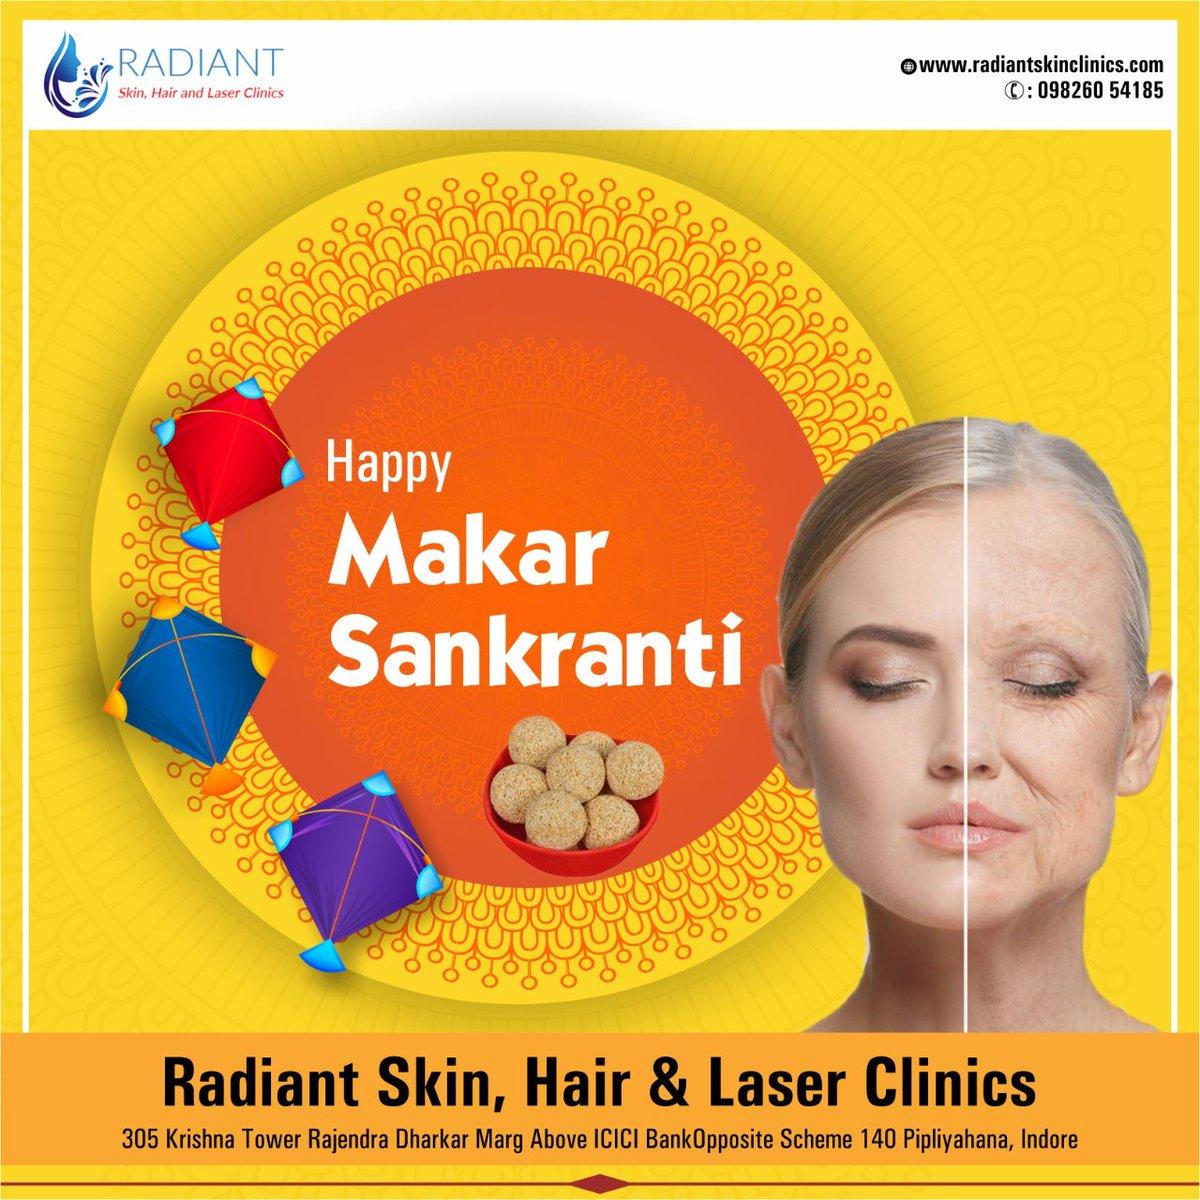 Wish you a happy Makar Sankranti  2021 by Dr. Abhishek  Malviya, Dr. Abhishek Malviya is a Dermatologist, Cosmetologist, Laser Surgeon Specialist, and Hair Transplant Surgeon in Pipliyahana, Indore (m.p) Get more info. visit: https://t.co/c3PLUuMl6h #MakarSankranti #Sankranti https://t.co/kse7jEIbwc